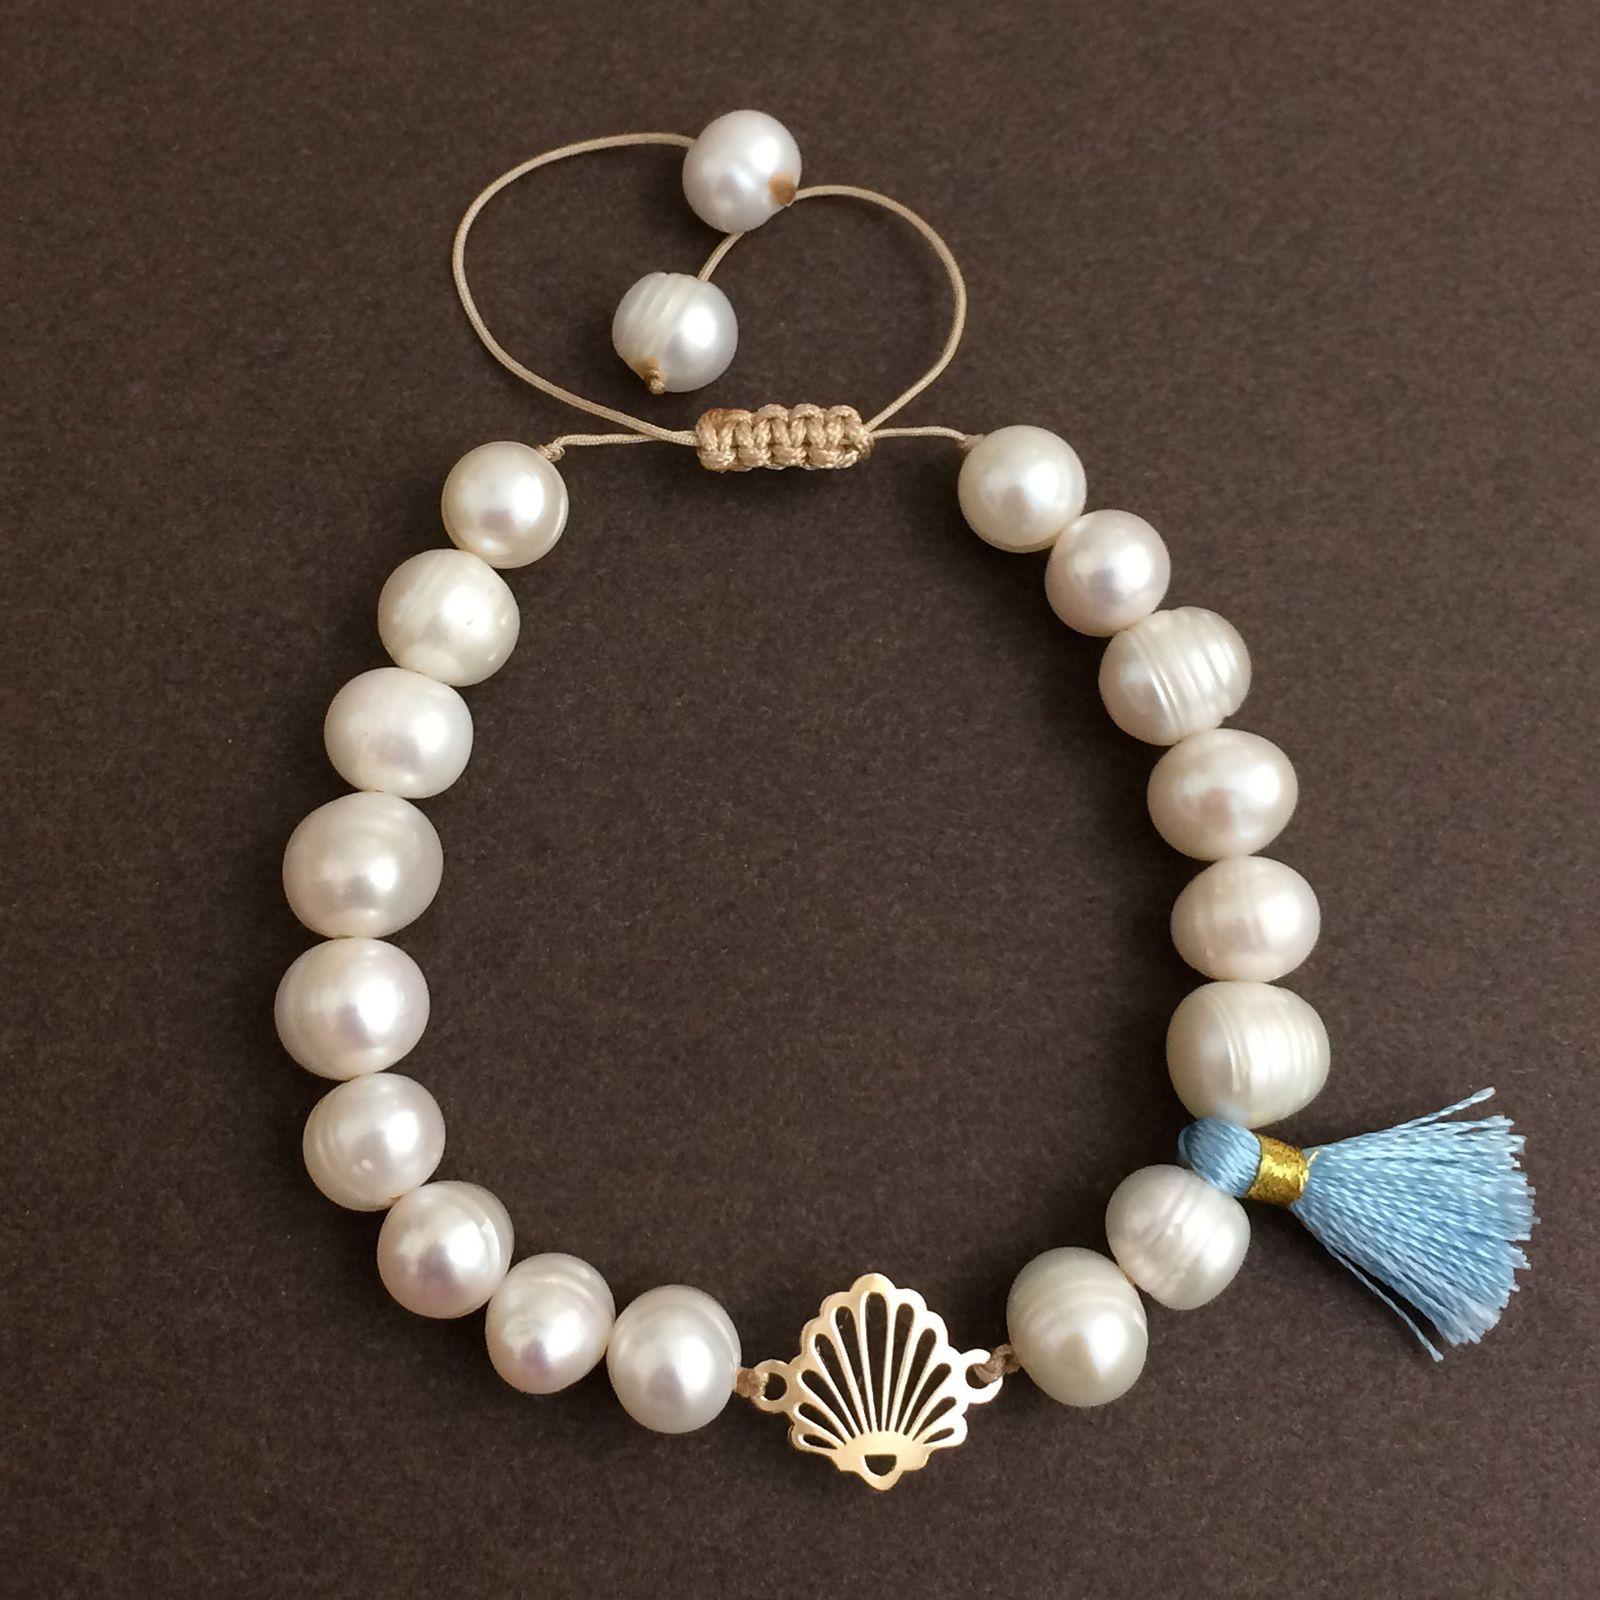 دستبند طلا 18 عیار زنانه الماسین آذر کد SADAF03 -  - 2